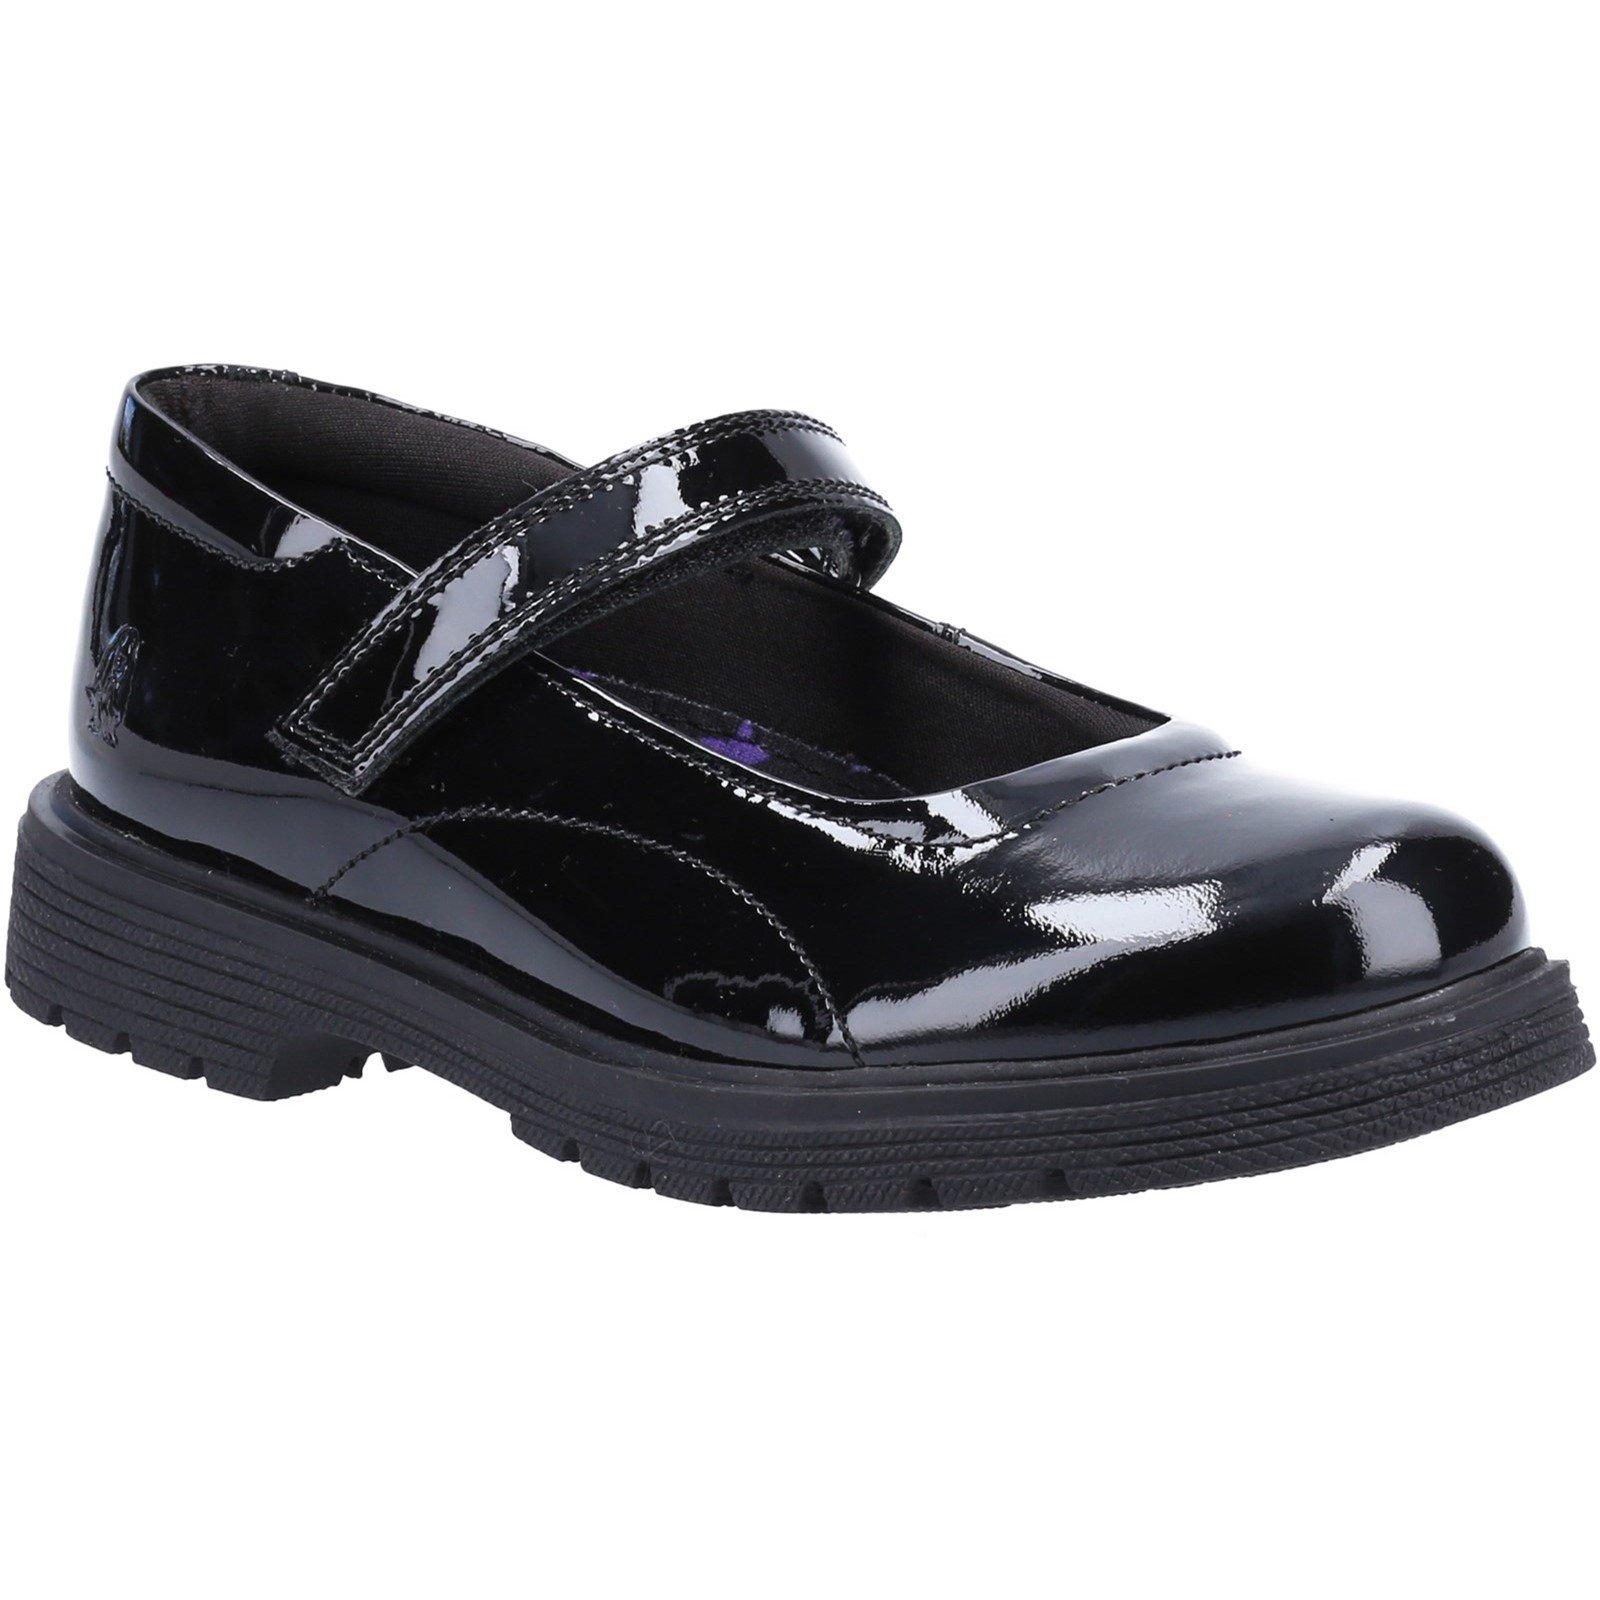 Hush Puppies Kid's Tally Junior School Shoe Patent Black 32814 - Patent Black 12